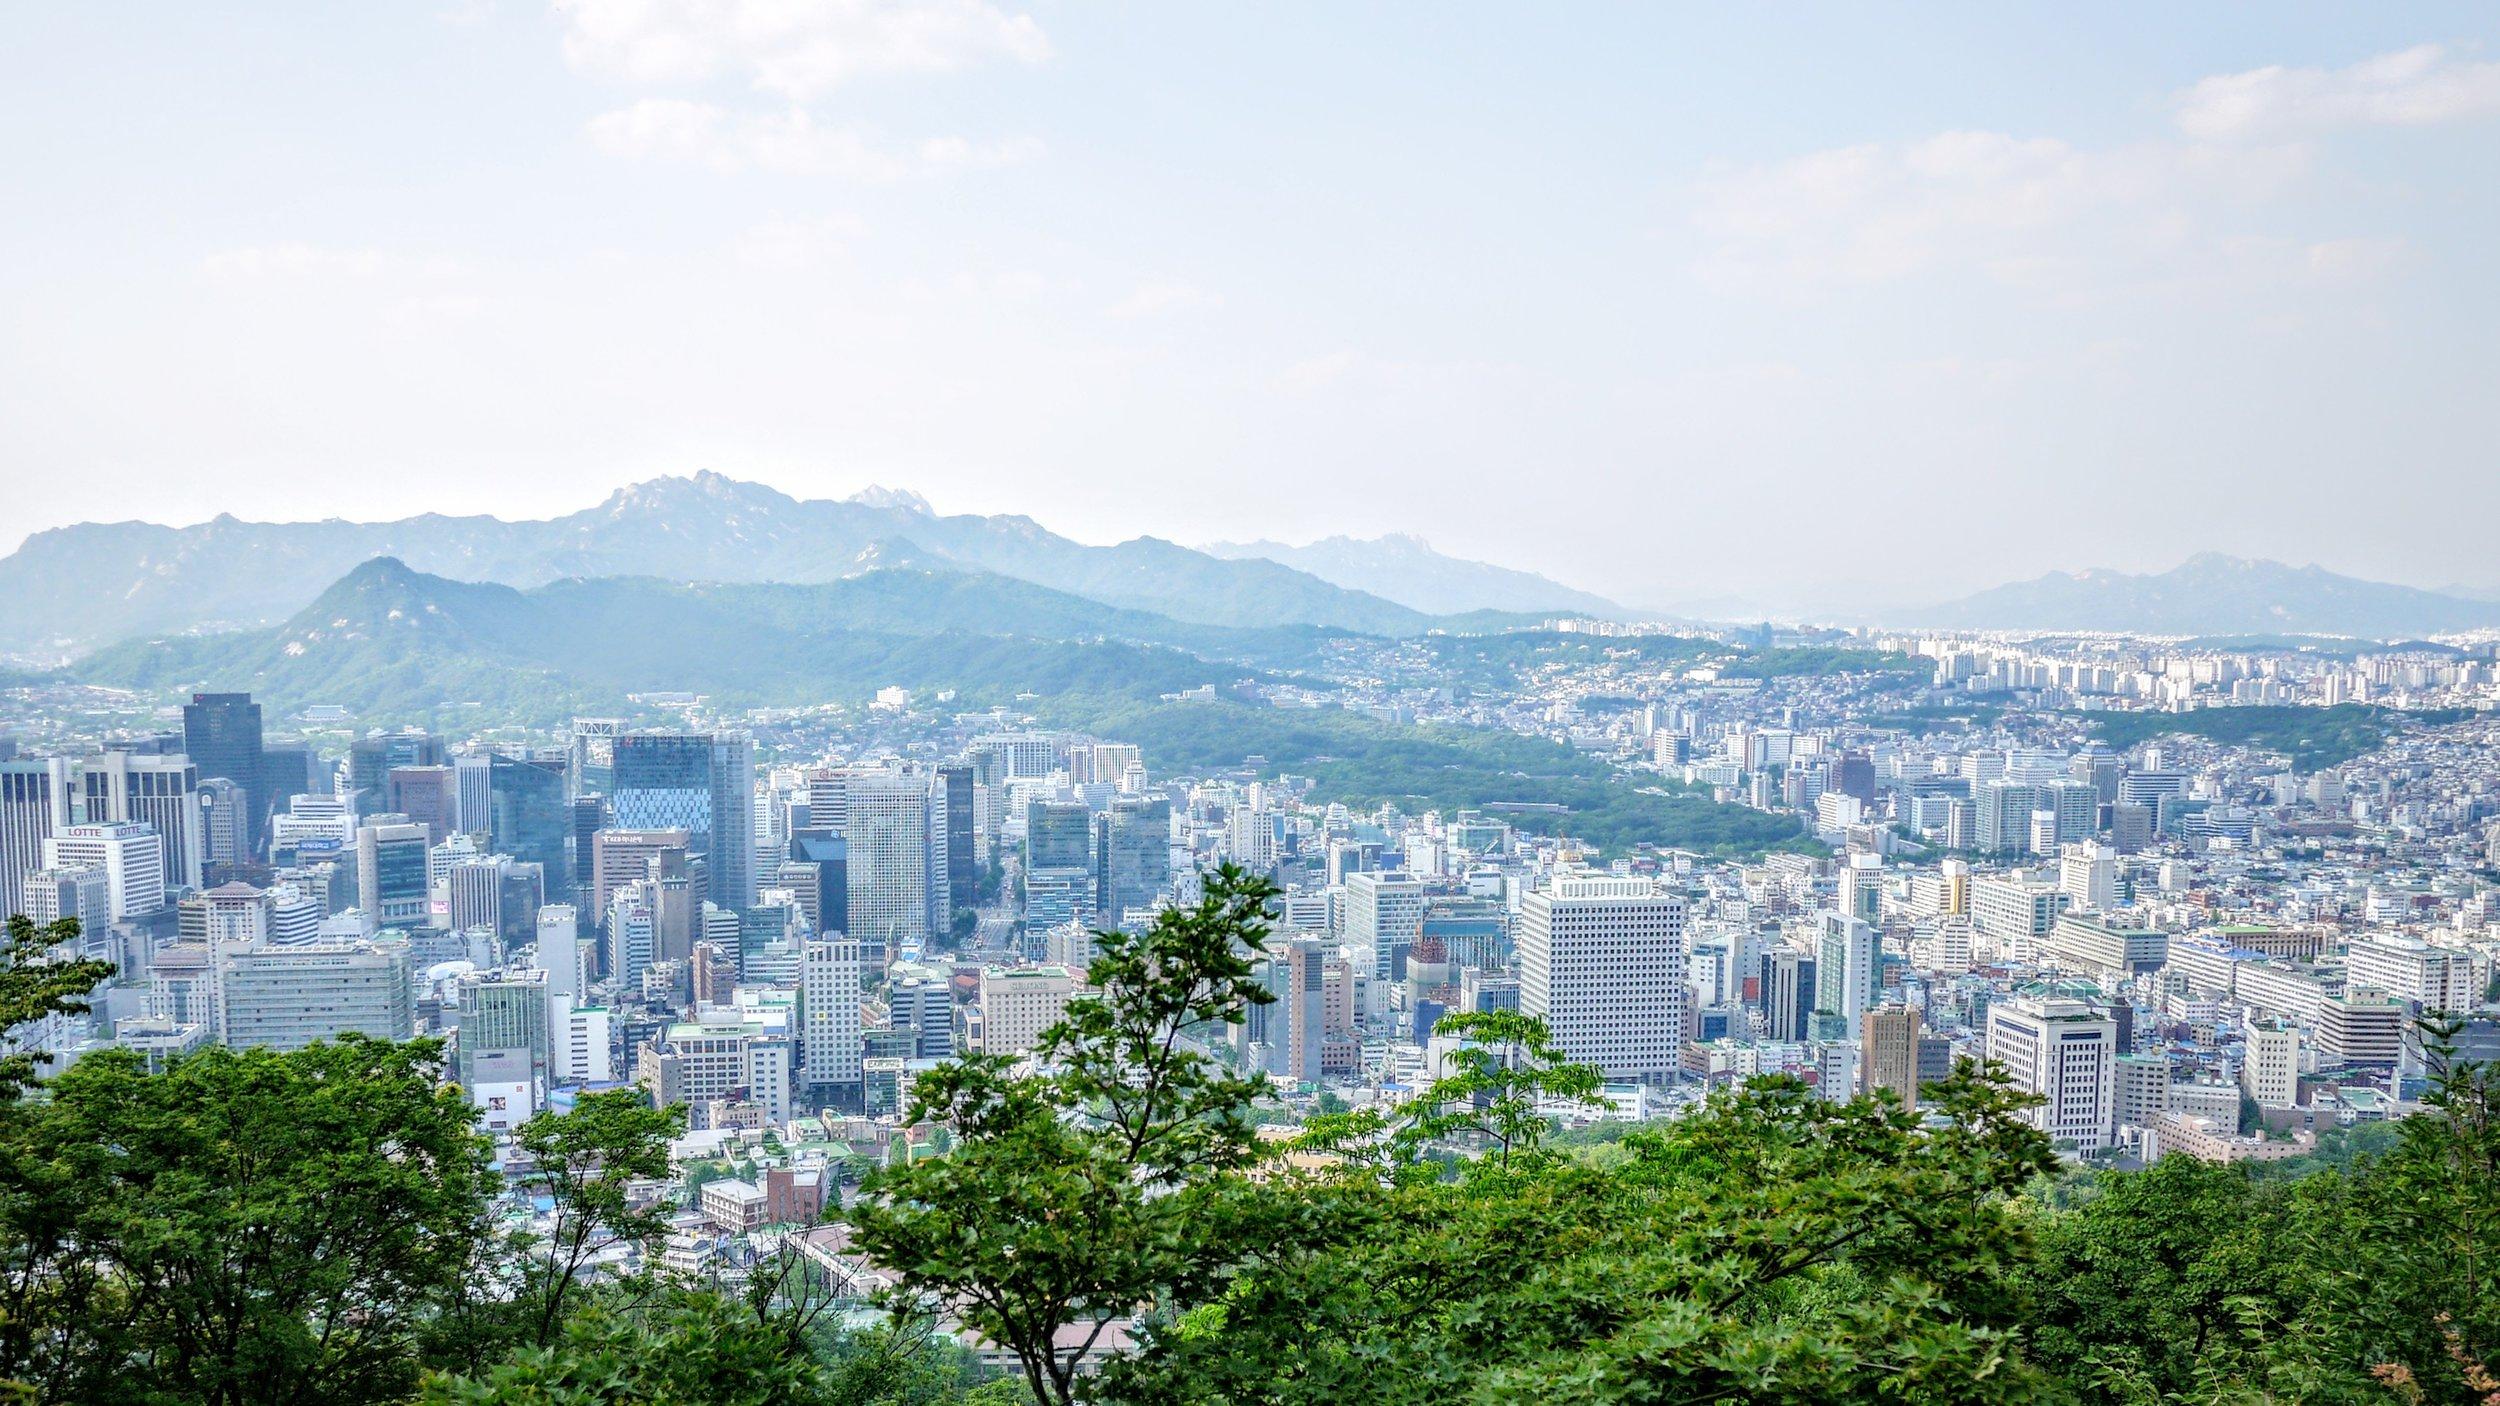 Seoul by Emile-Victor Portenart //Unsplash